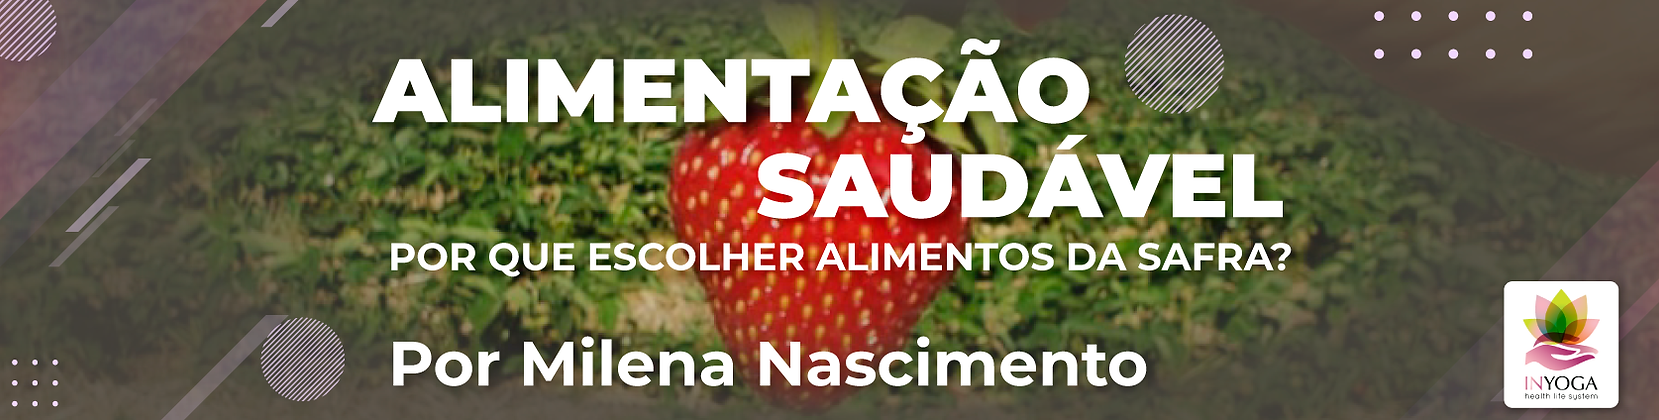 alimentacao-saudavel-blog-16x424.png